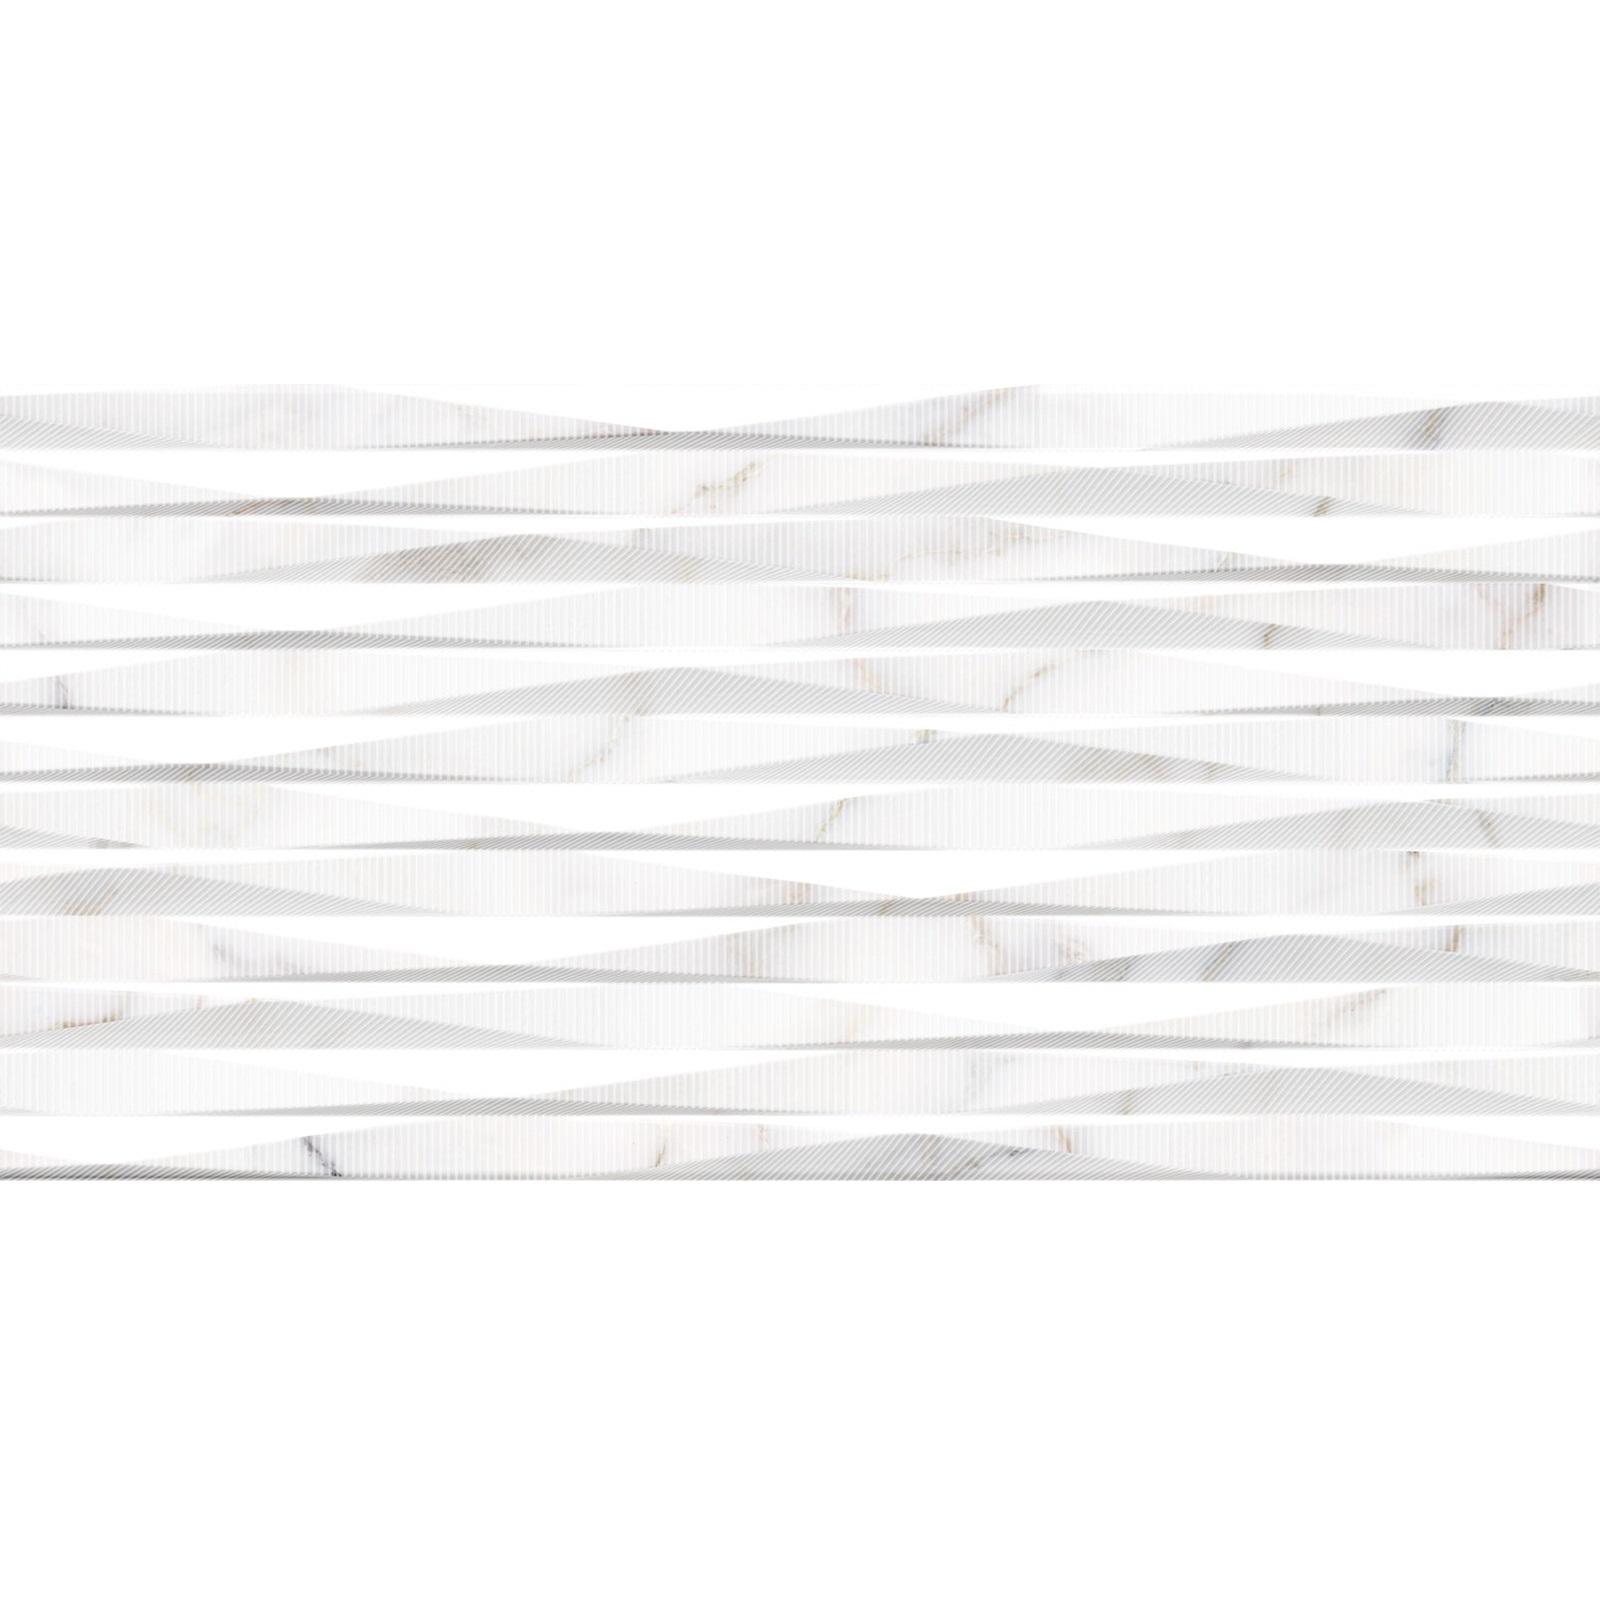 Плитка Alma Ceramica Grigio TWU09GRG017 24,9x50x0,85 см декор alma ceramica grigio dwu09grg027 24 9x50 см